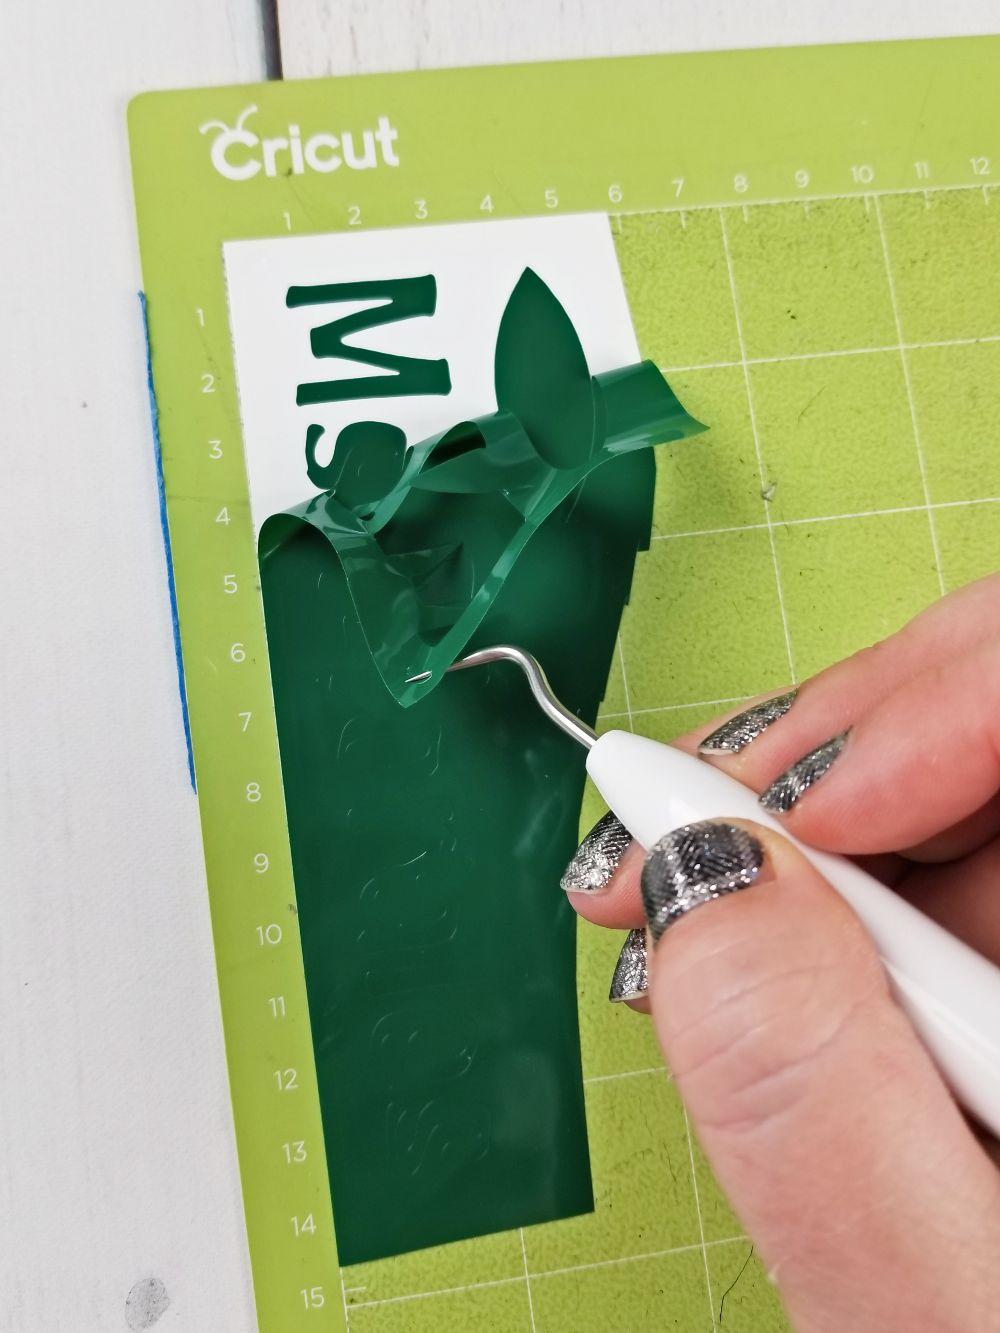 weeding adhesive vinyl cricut